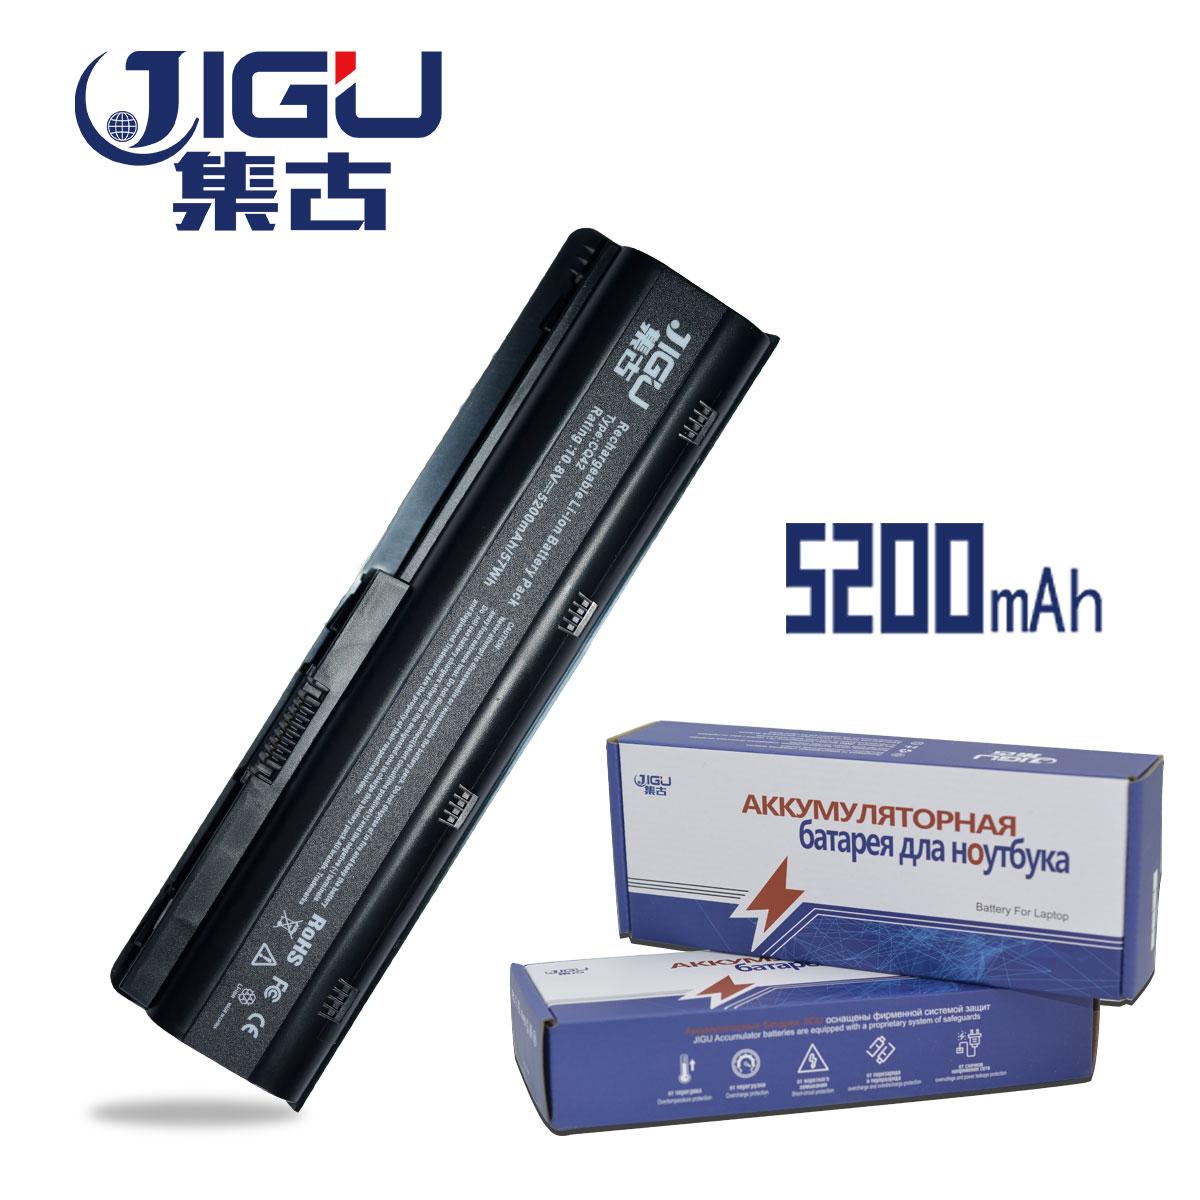 JIGU Laptop Battery For HP Pavilion DM4 DV3 DV6 G32 DV7 G62 DV5 G56 G72 For COMPAQ Presario CQ32 CQ42 CQ56 CQ62 CQ630 CQ72 MU06 free shipping 628186 001 for hp pavilion dv3 4000 dm4 cq32 g32 laptop motherboard hm55 100